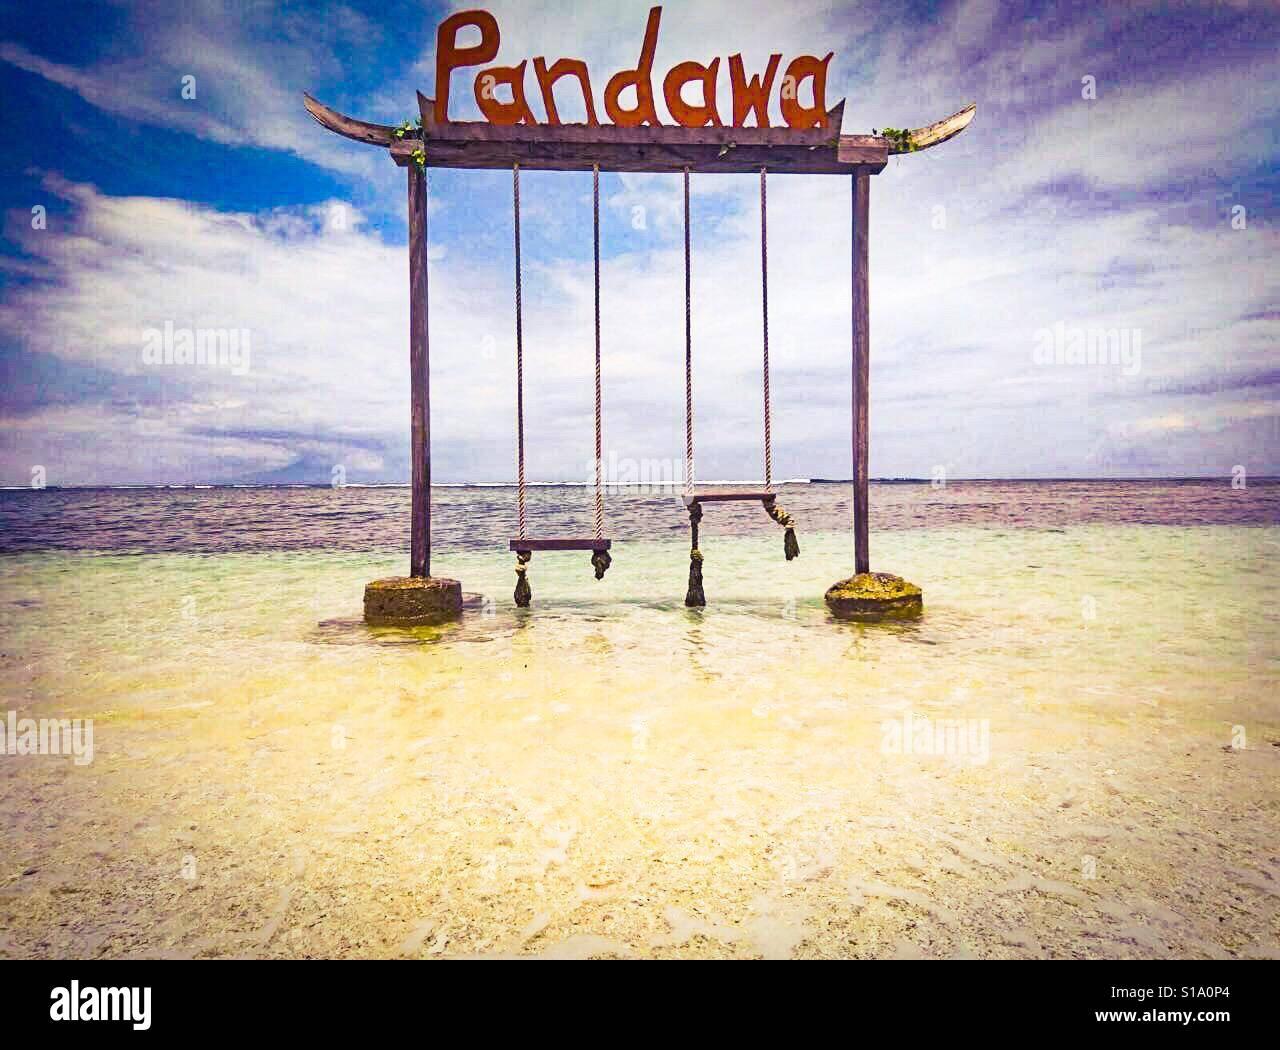 Especial de Pandawa, columpios en el mar en Indonesia Foto de stock